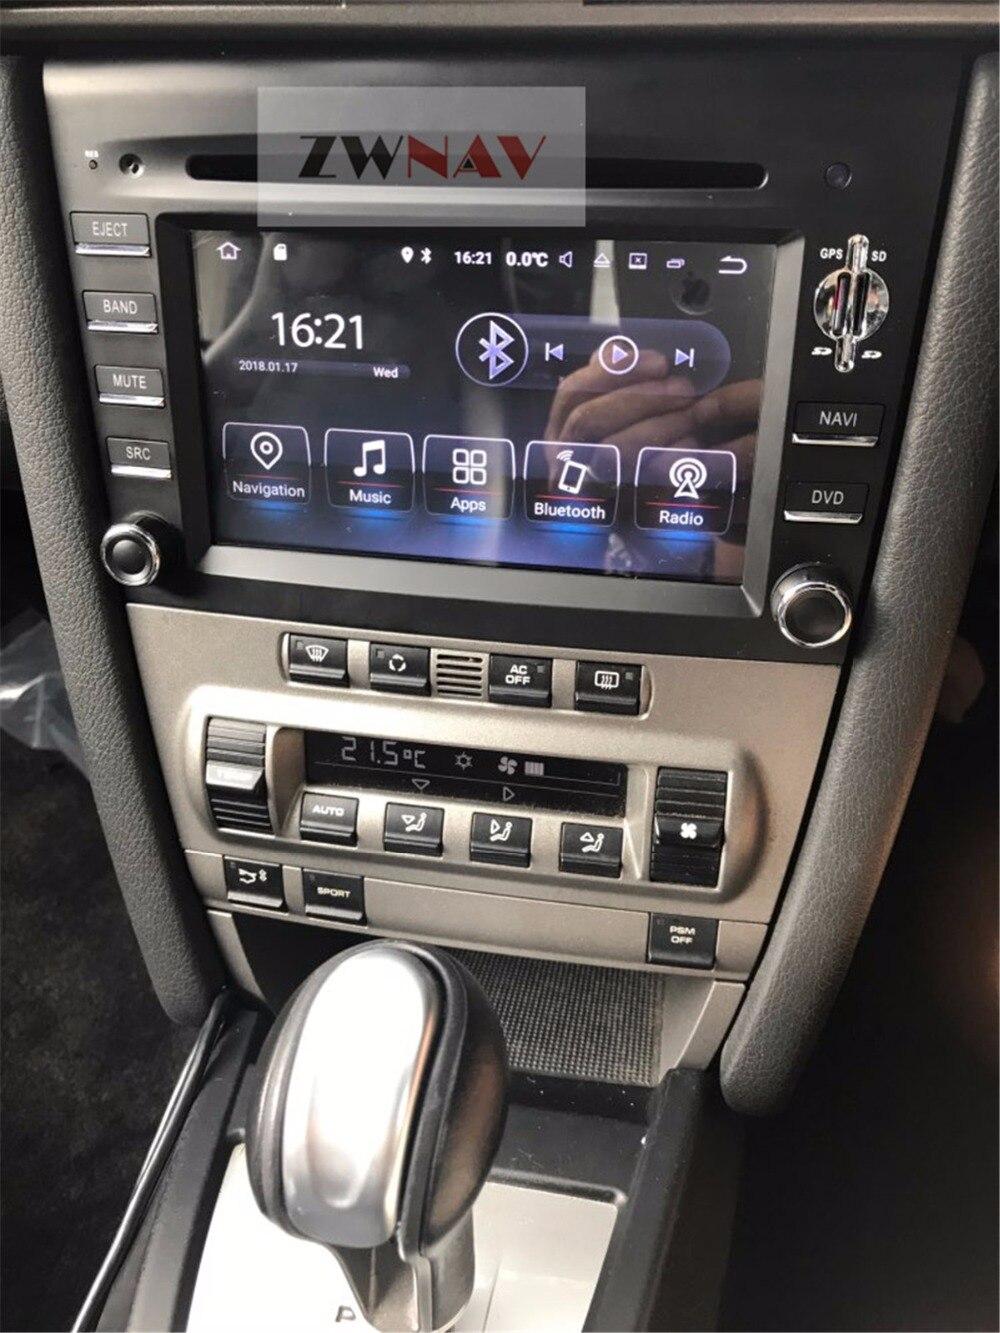 6.2 Android Car GPS Navigation Anti-dazzling Screen Radio DVD Player for Porsche 911 997 CAYMAN 2005-2008 BOXTER 2005-2012 playmobil лицензионные автомобили porsche 911 targa 4s 5991